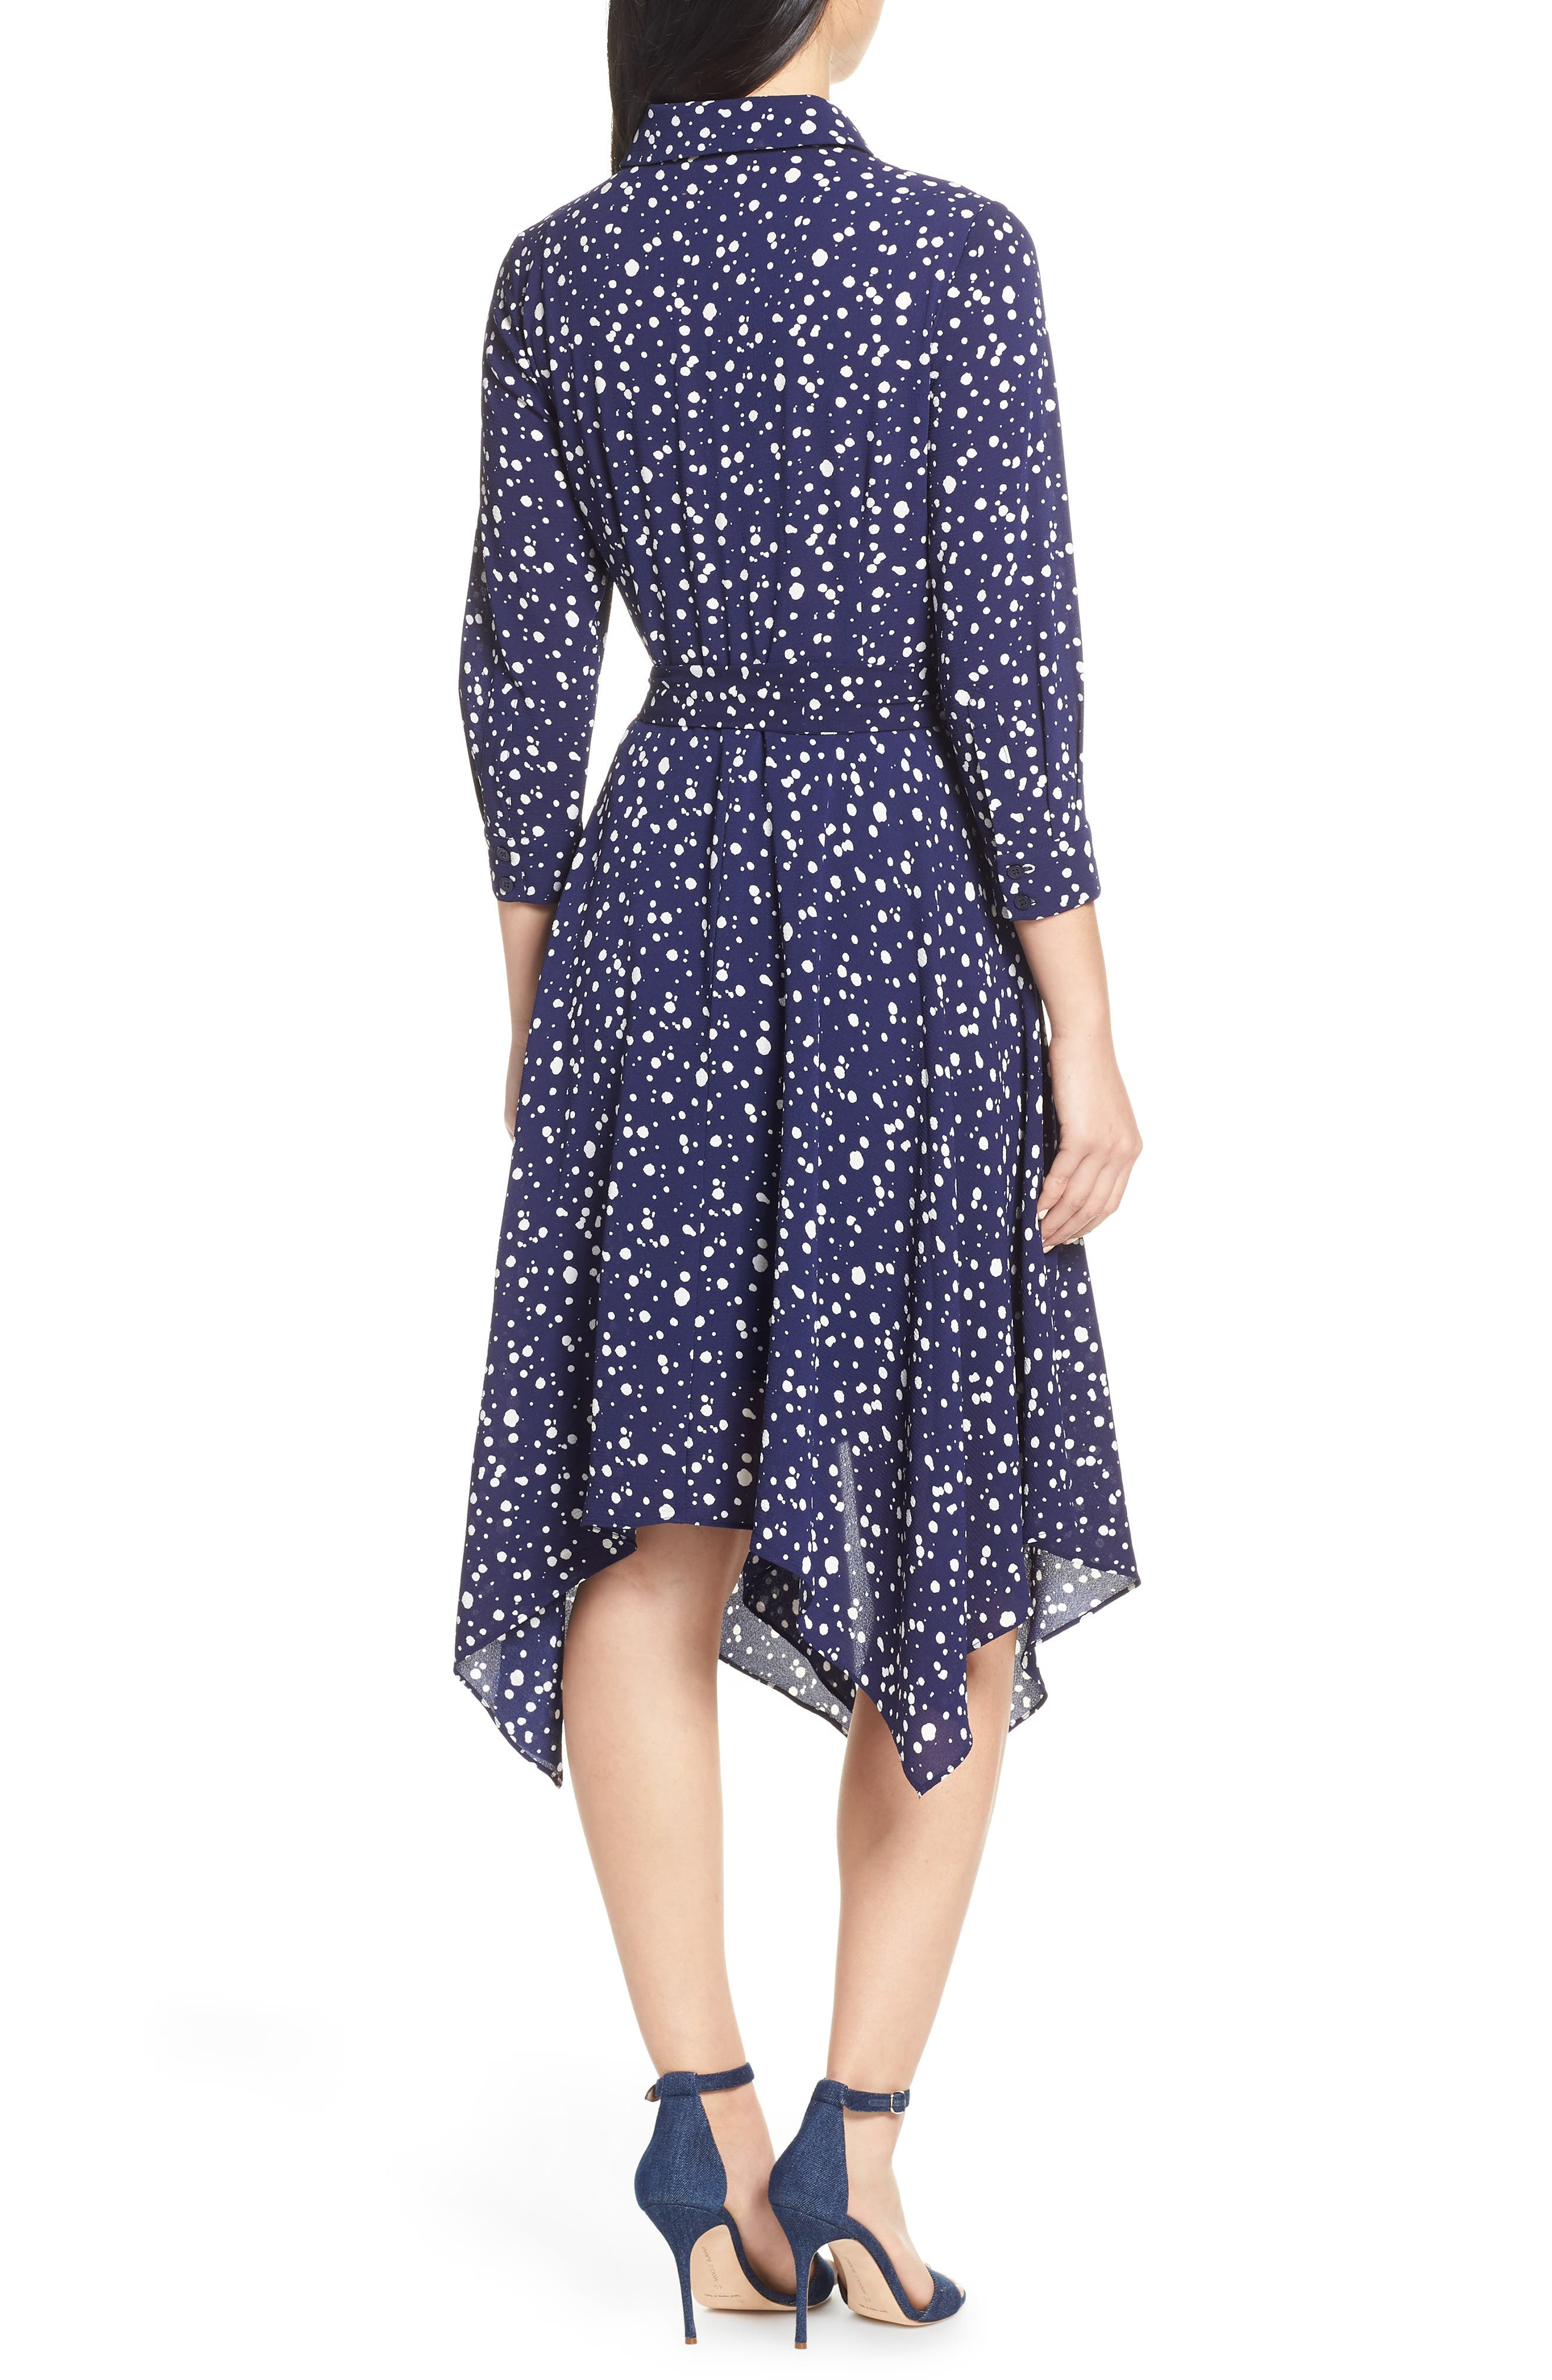 ELIZA J, Handkerchief Hem Midi Dress, Alternate thumbnail 2, color, 410